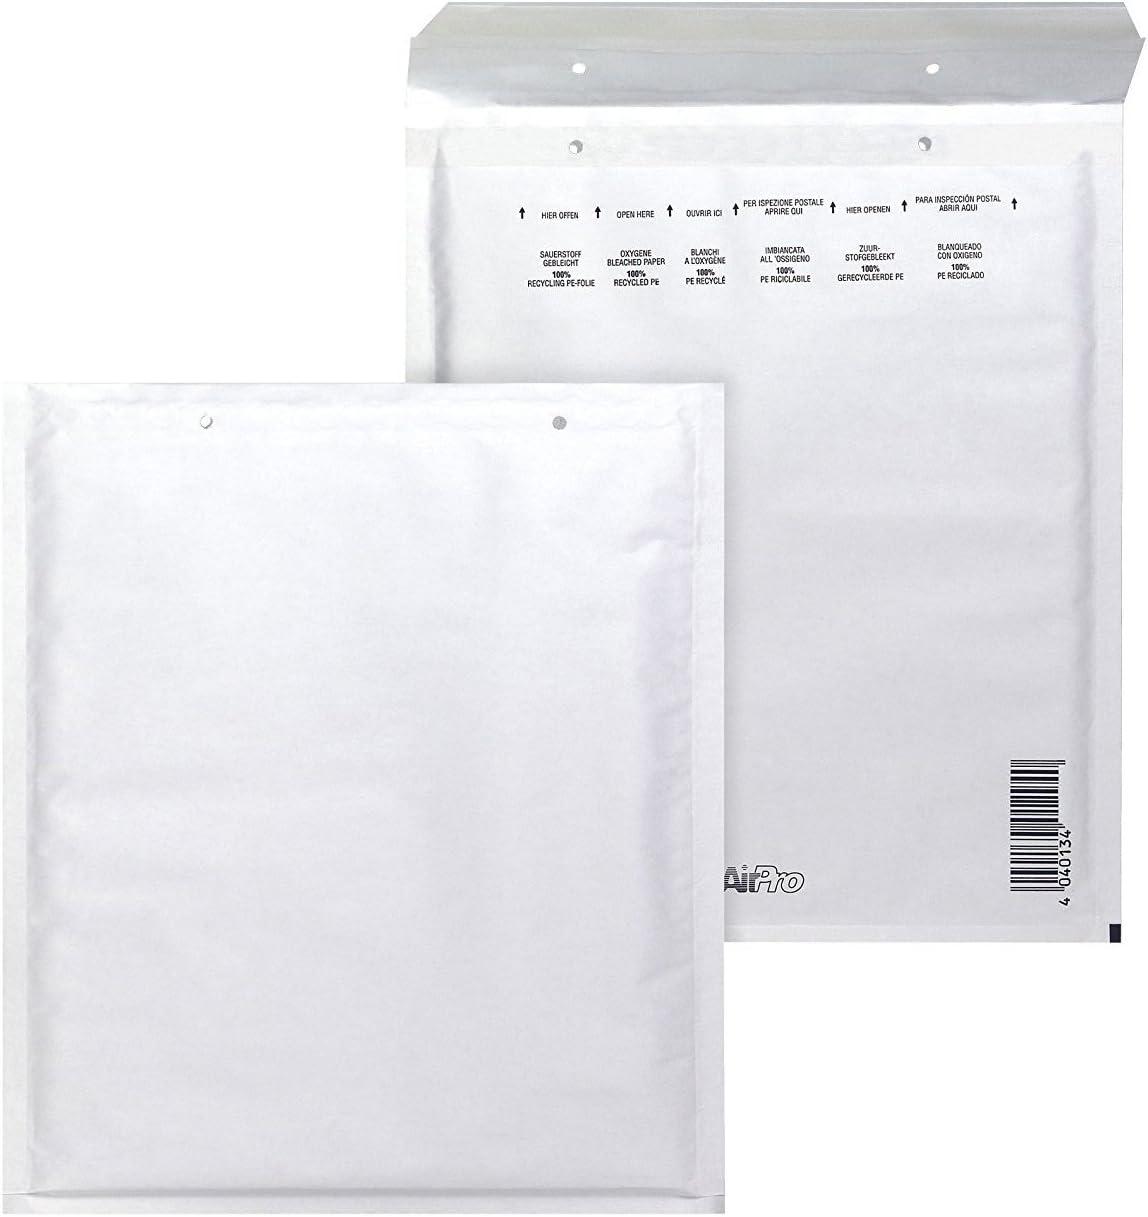 Bong AirPro - Pack de 100 bolsas acolchadas, 150 x 215 mm, color blanco